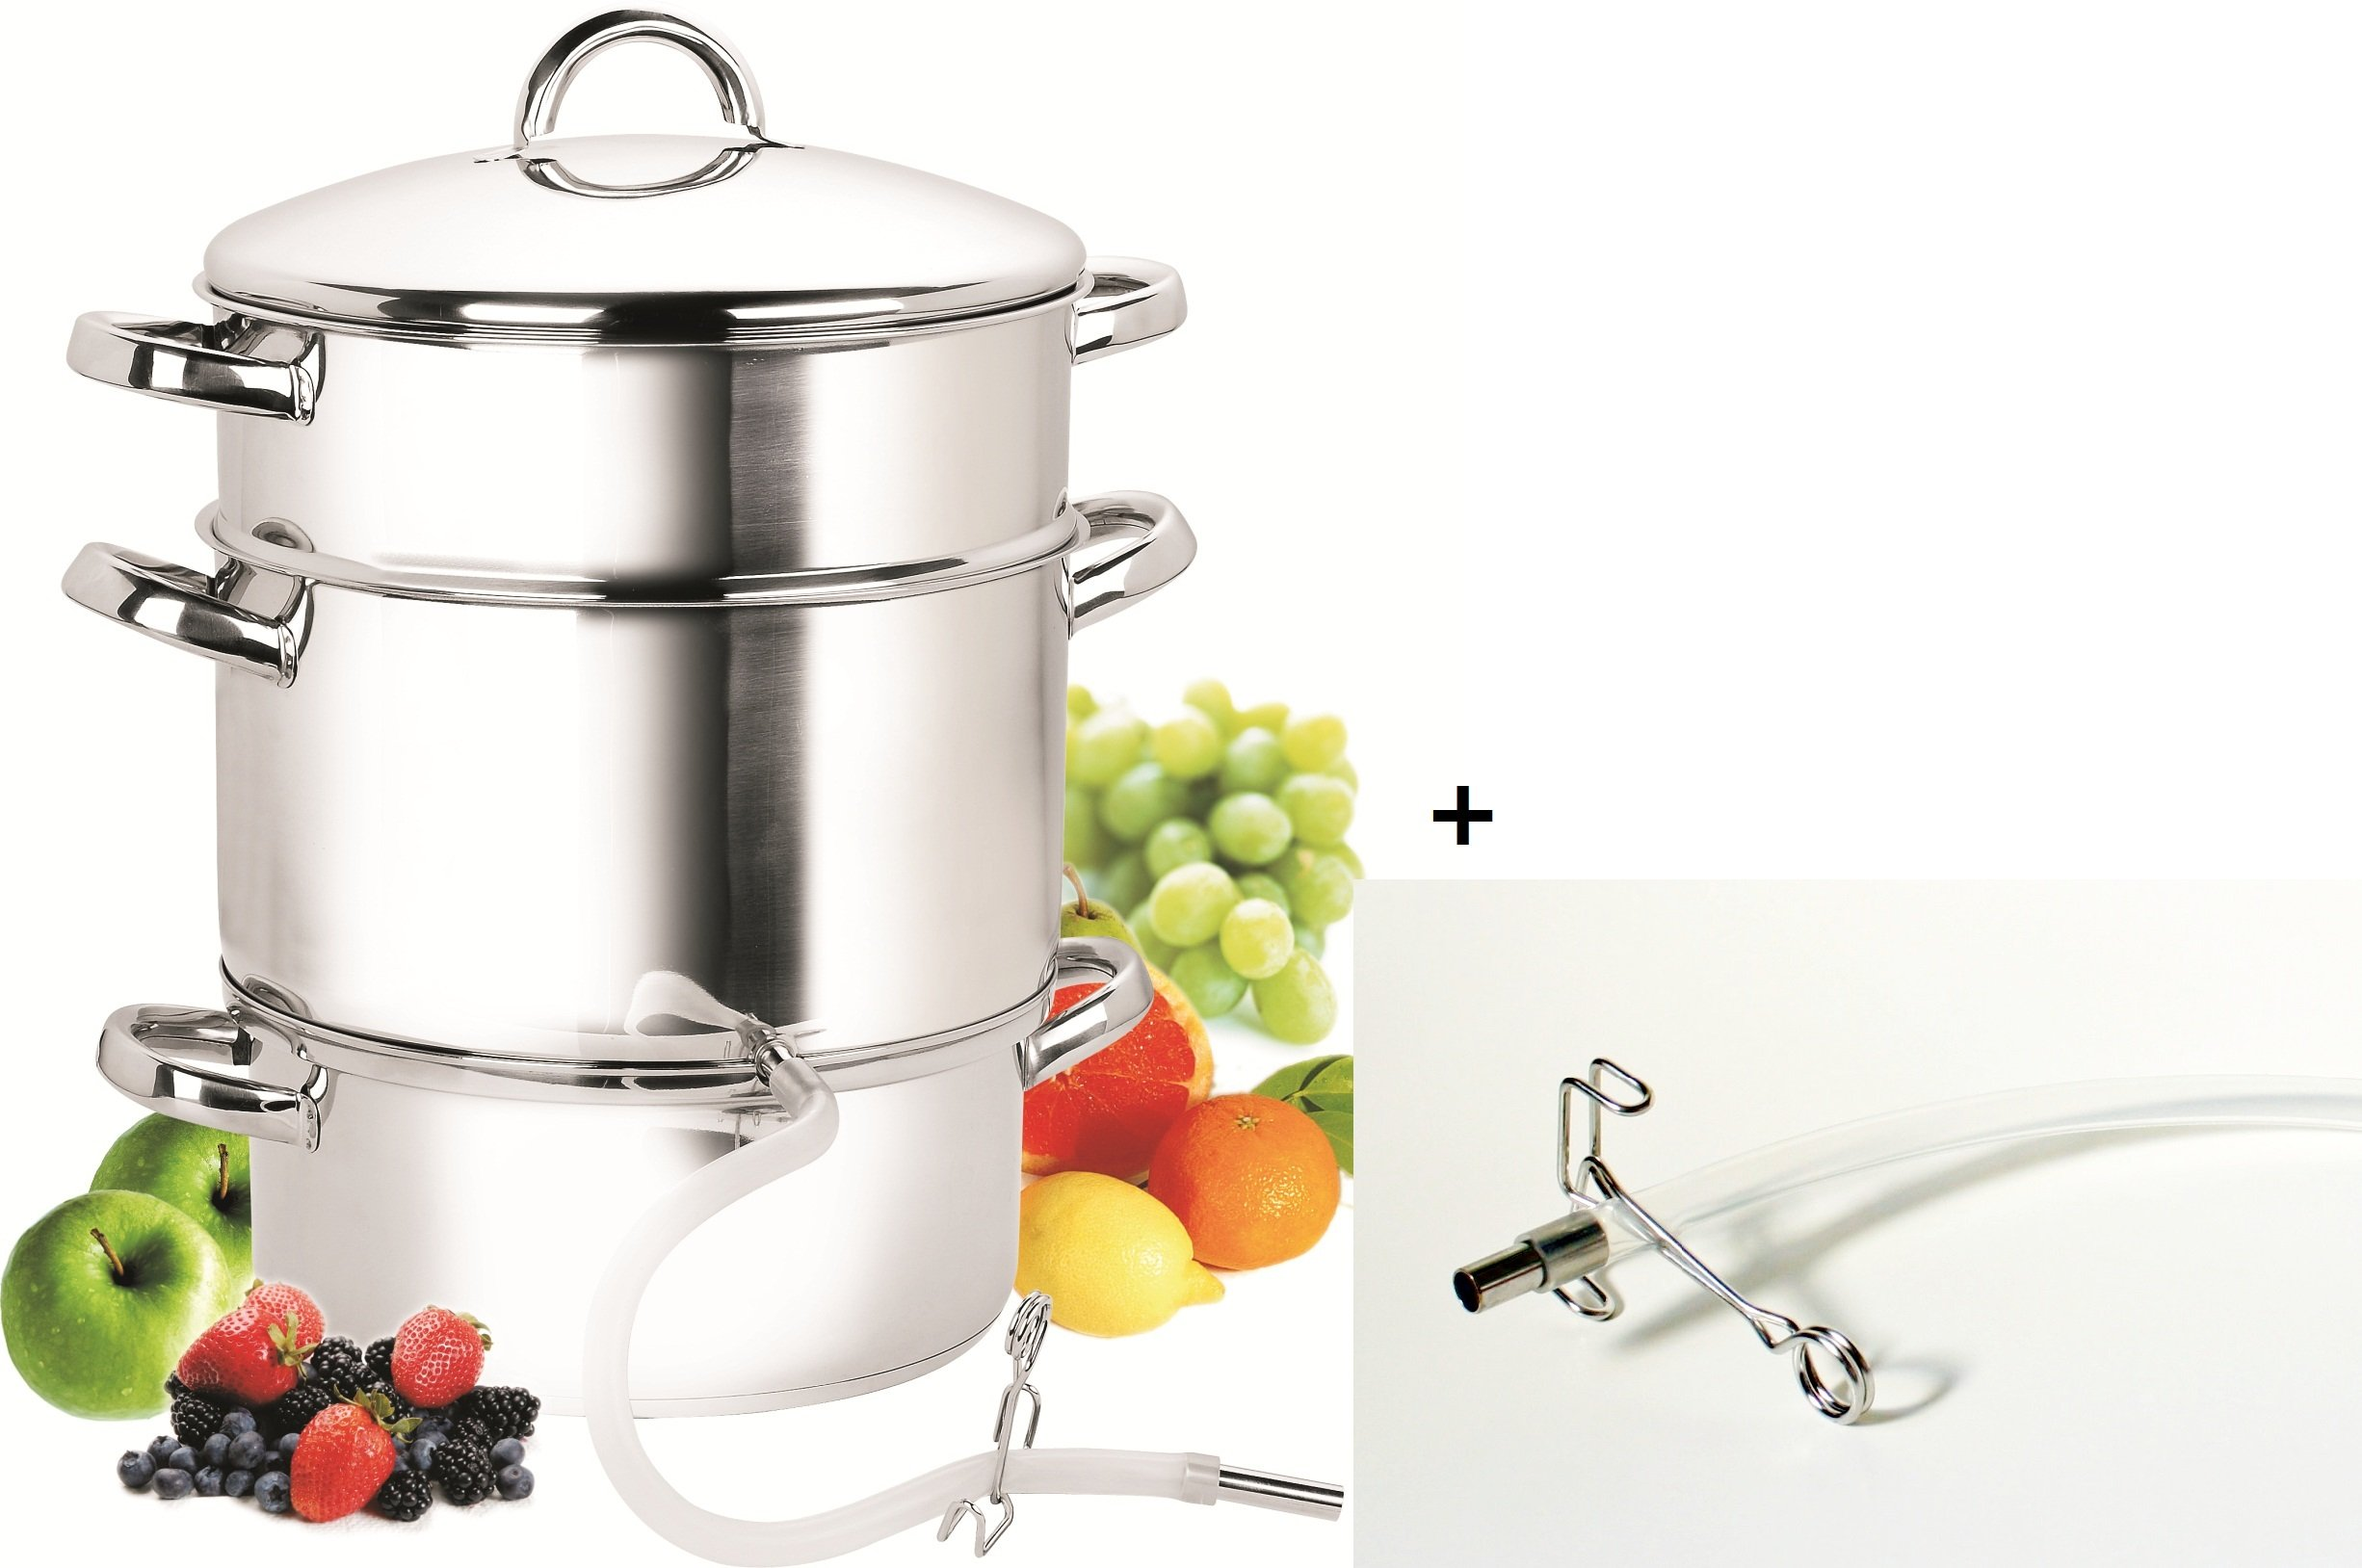 Cook N Home NC-00256 11-Quart Stainless-Steel Juicer Steamer by Cook N Home (Image #3)